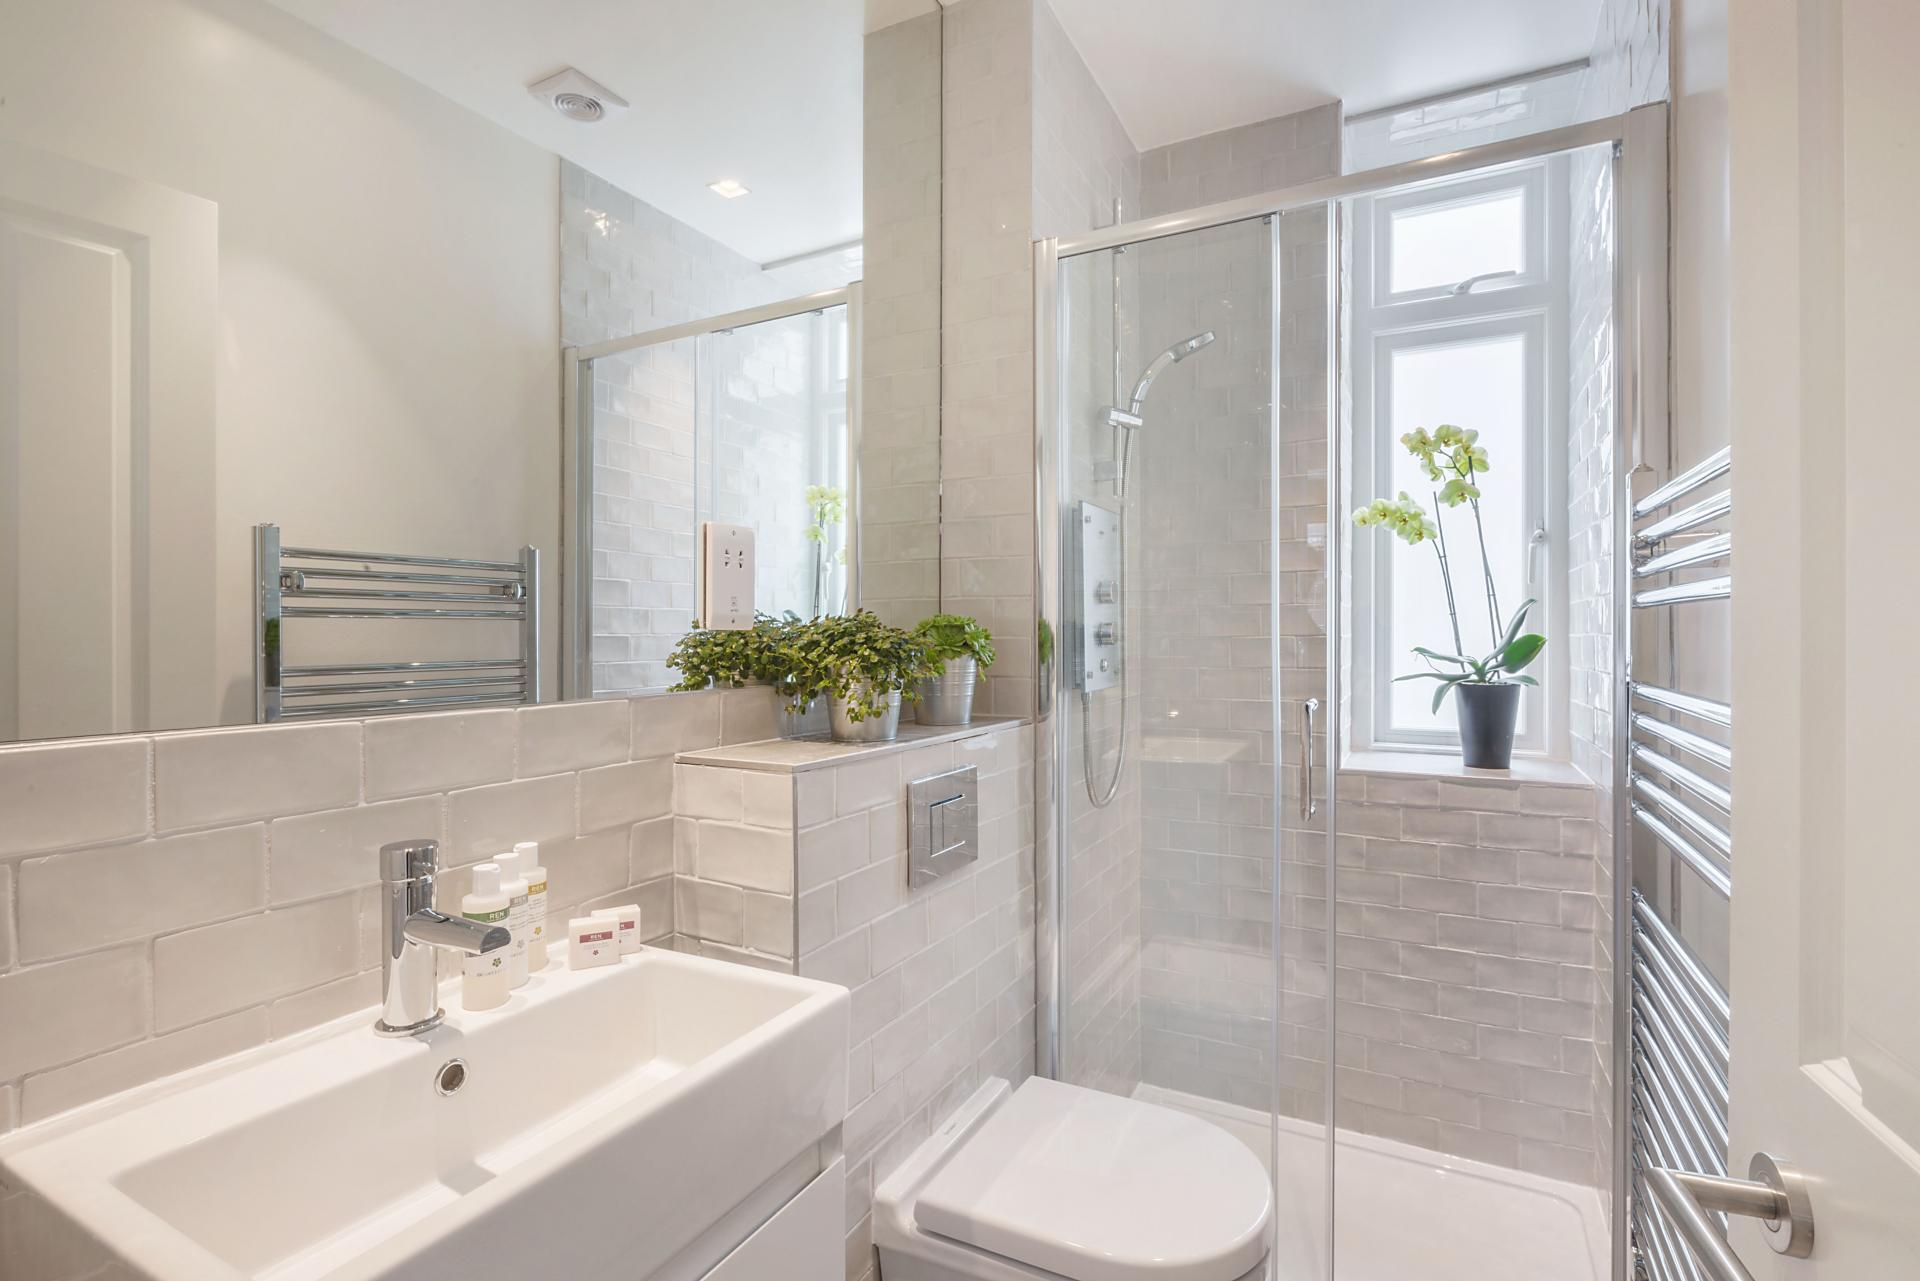 Bathroom at Marylebone - Wyndham Street Apartments - Citybase Apartments